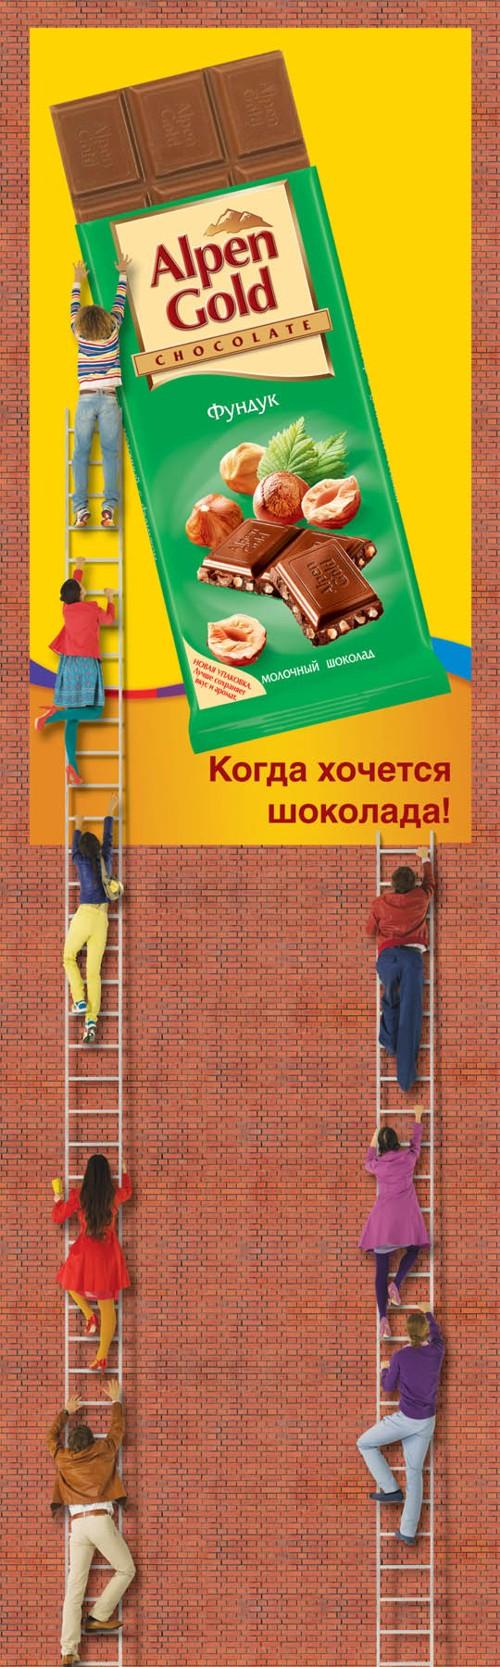 Реклама Alpen Gold Max Fun | Альпен Гольд Кола